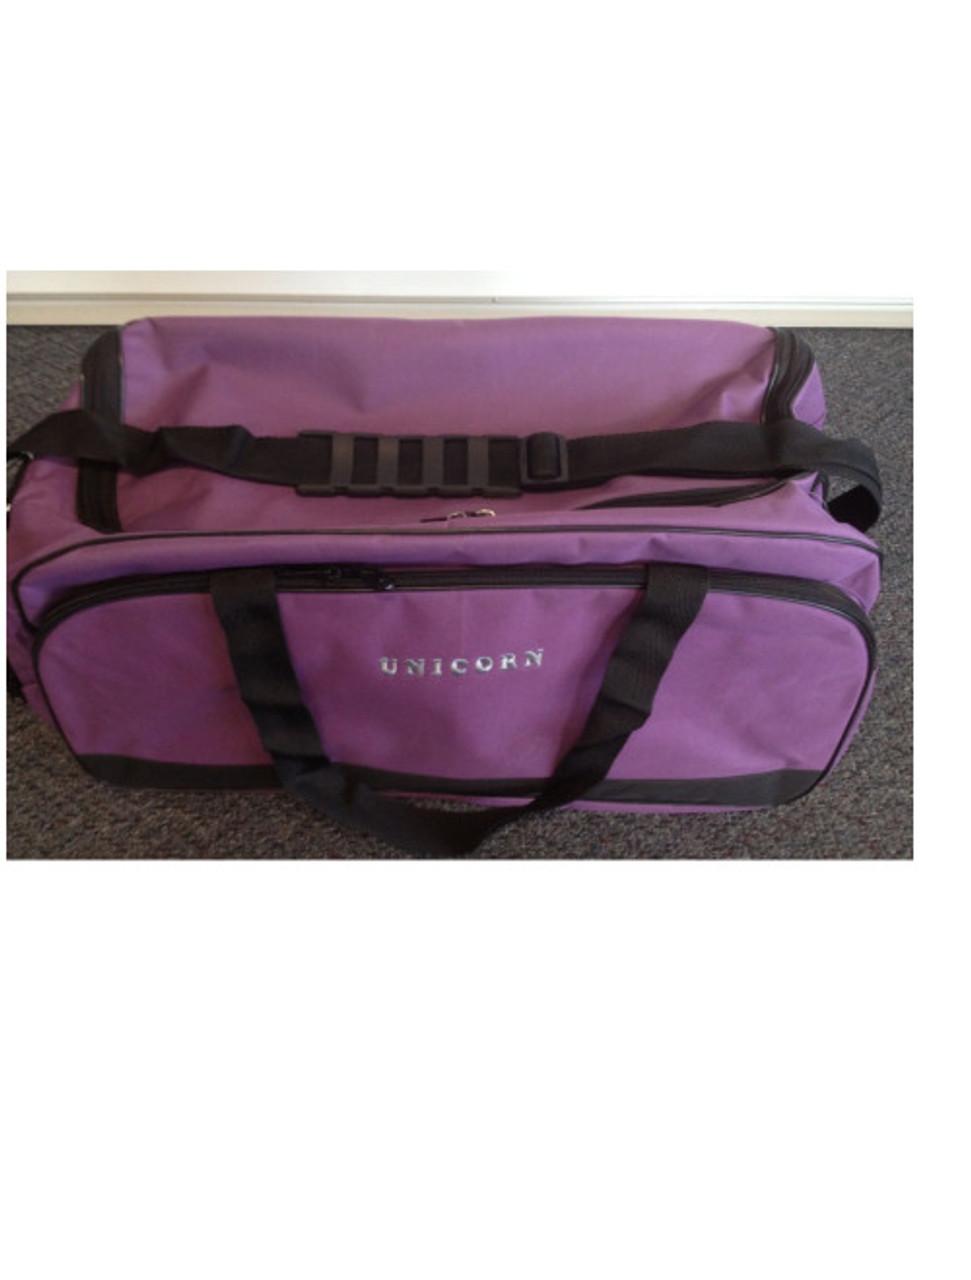 Horse Gear Bag Sports Gear Bag Overnight Bag Purple